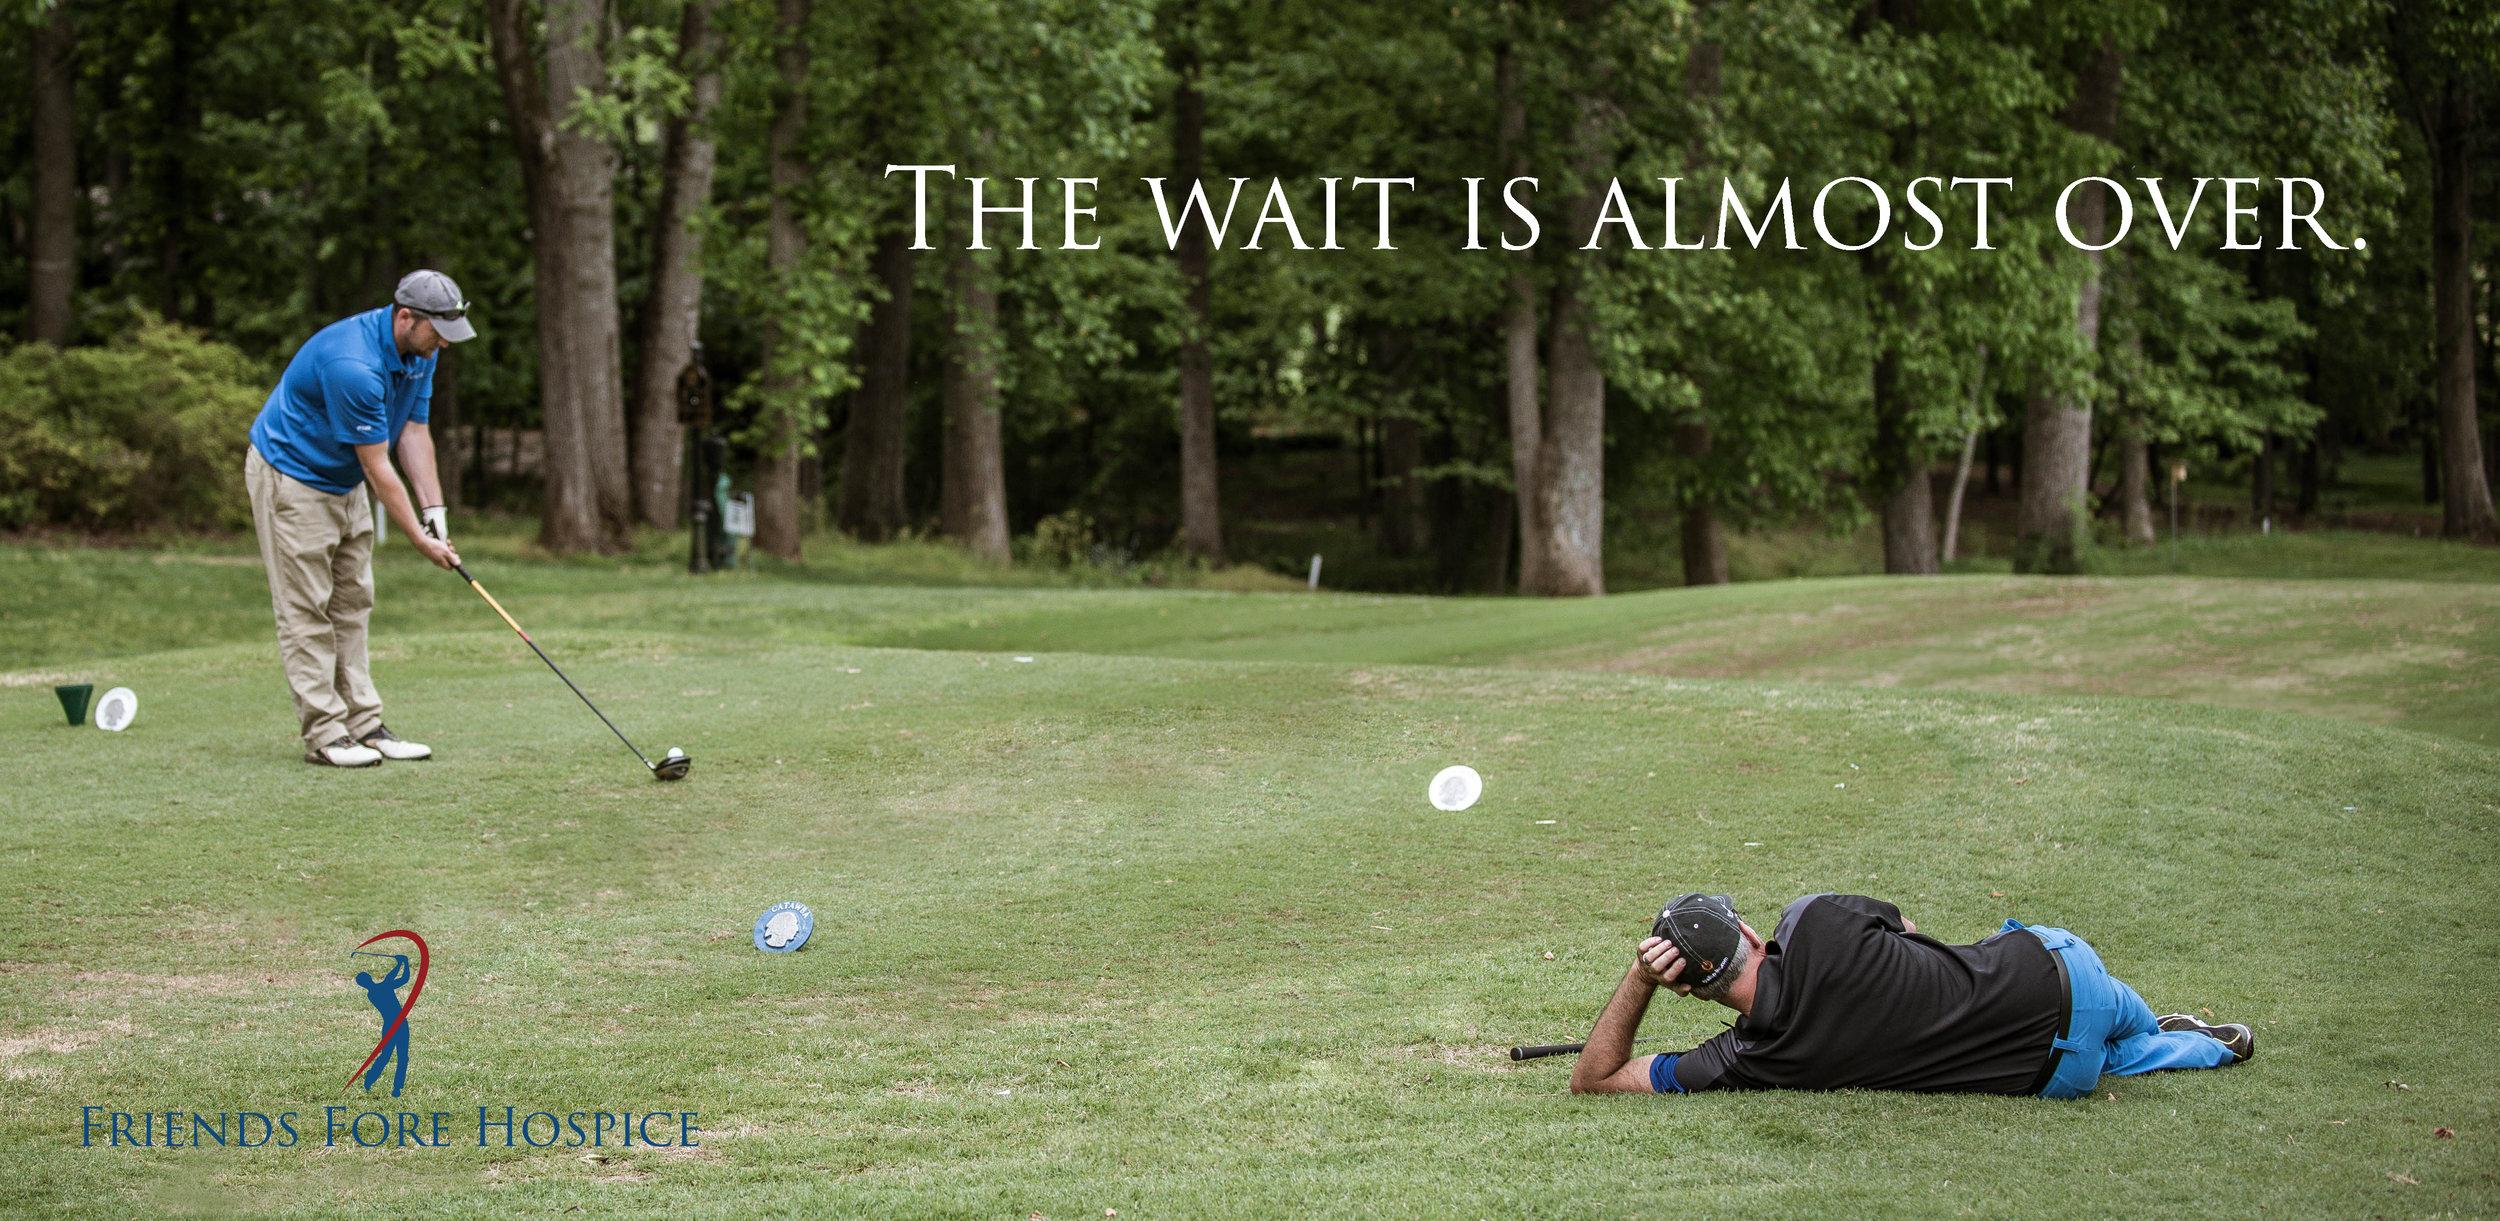 19.6.10 Golf Registrating Closed Image.jpg